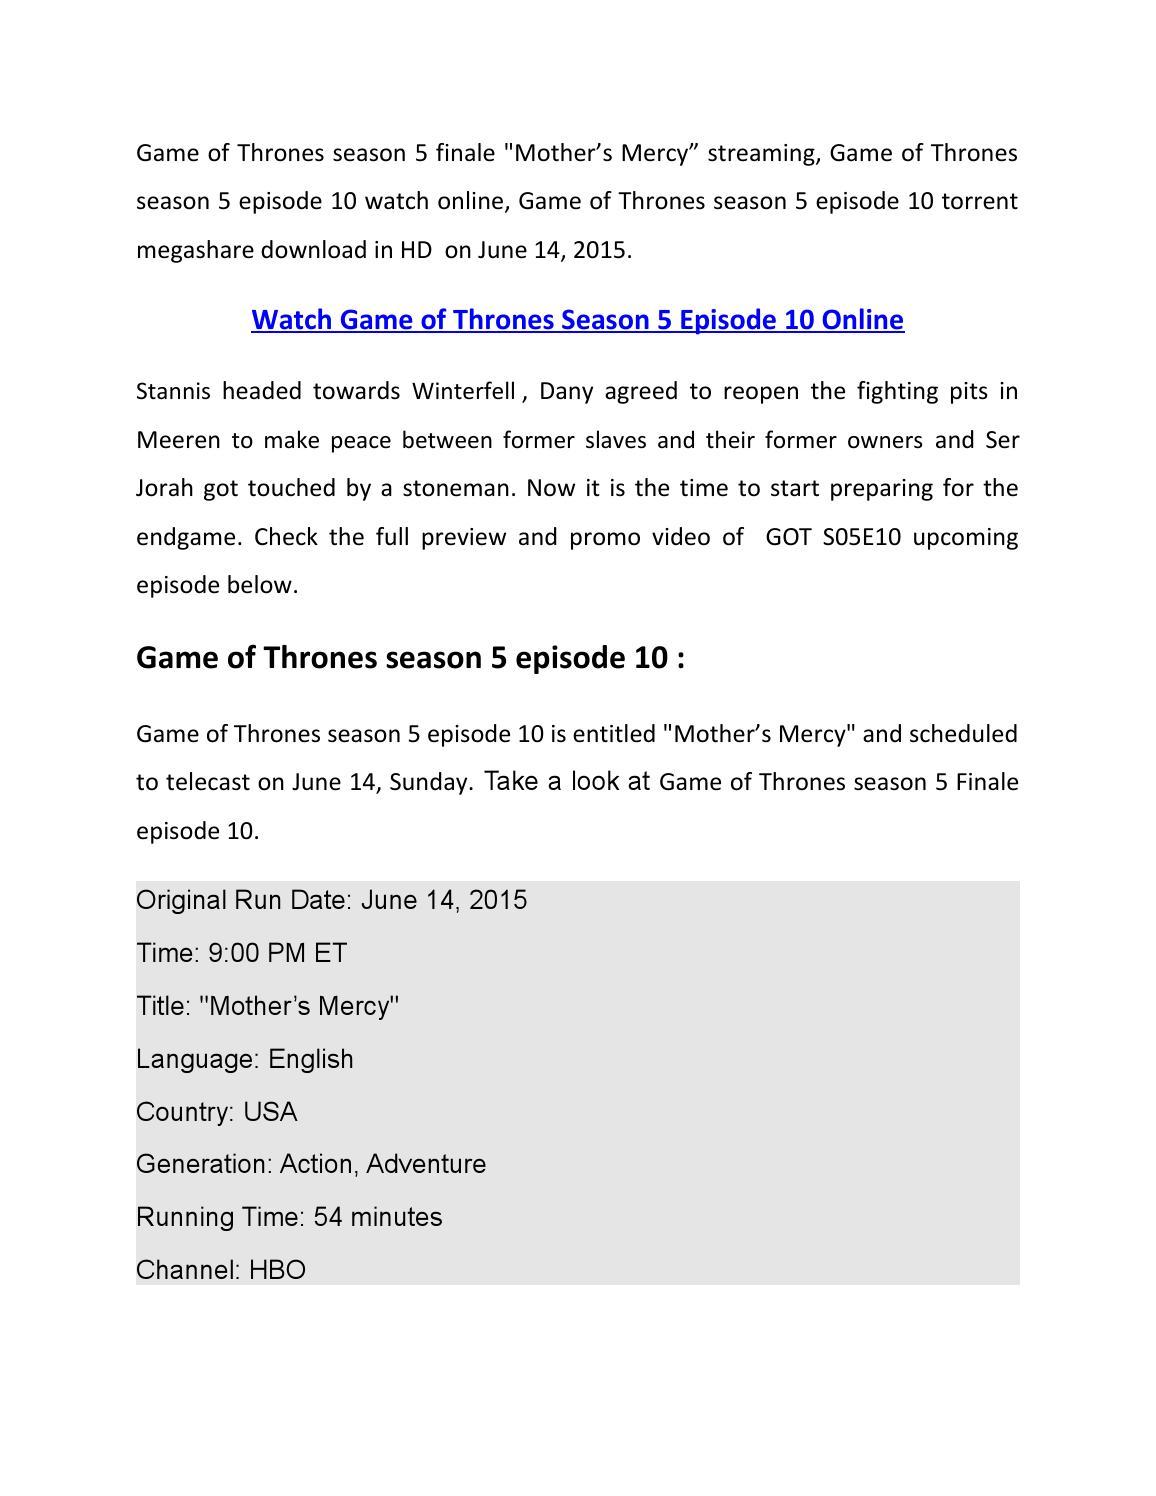 Finale']Watch Game of Thrones Season 5 Finale Episode 10 Online by